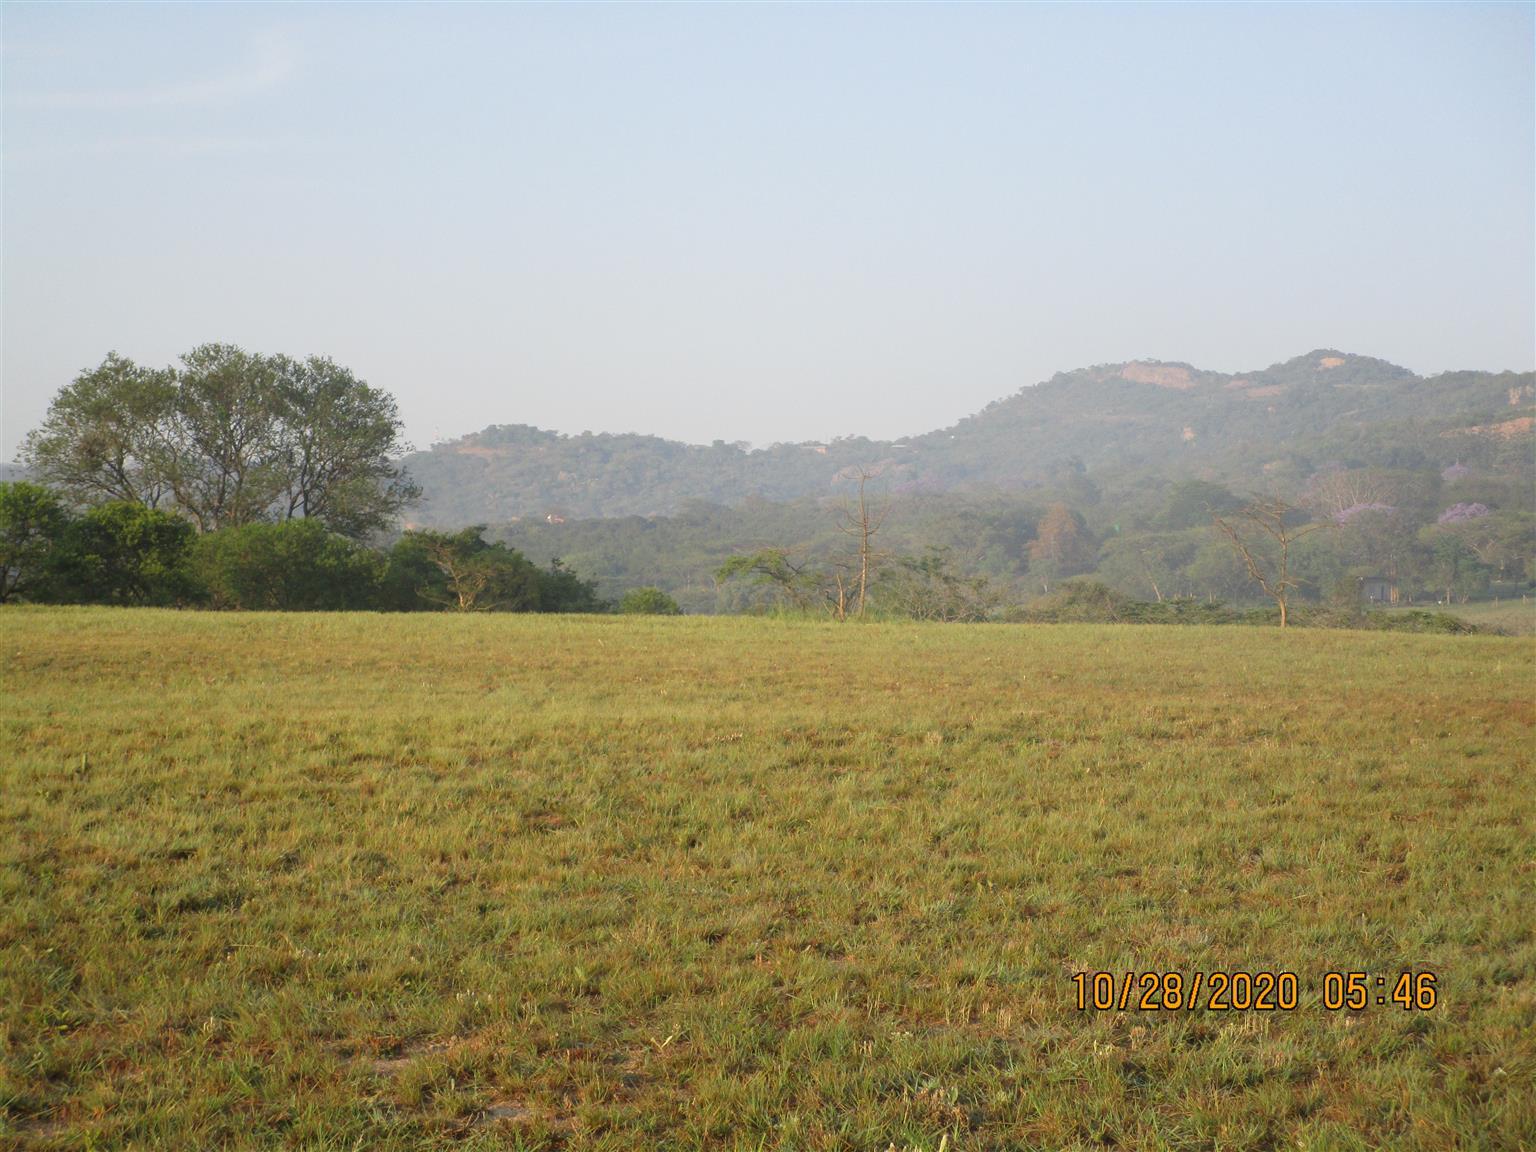 LAND/PLOT FOR SALE